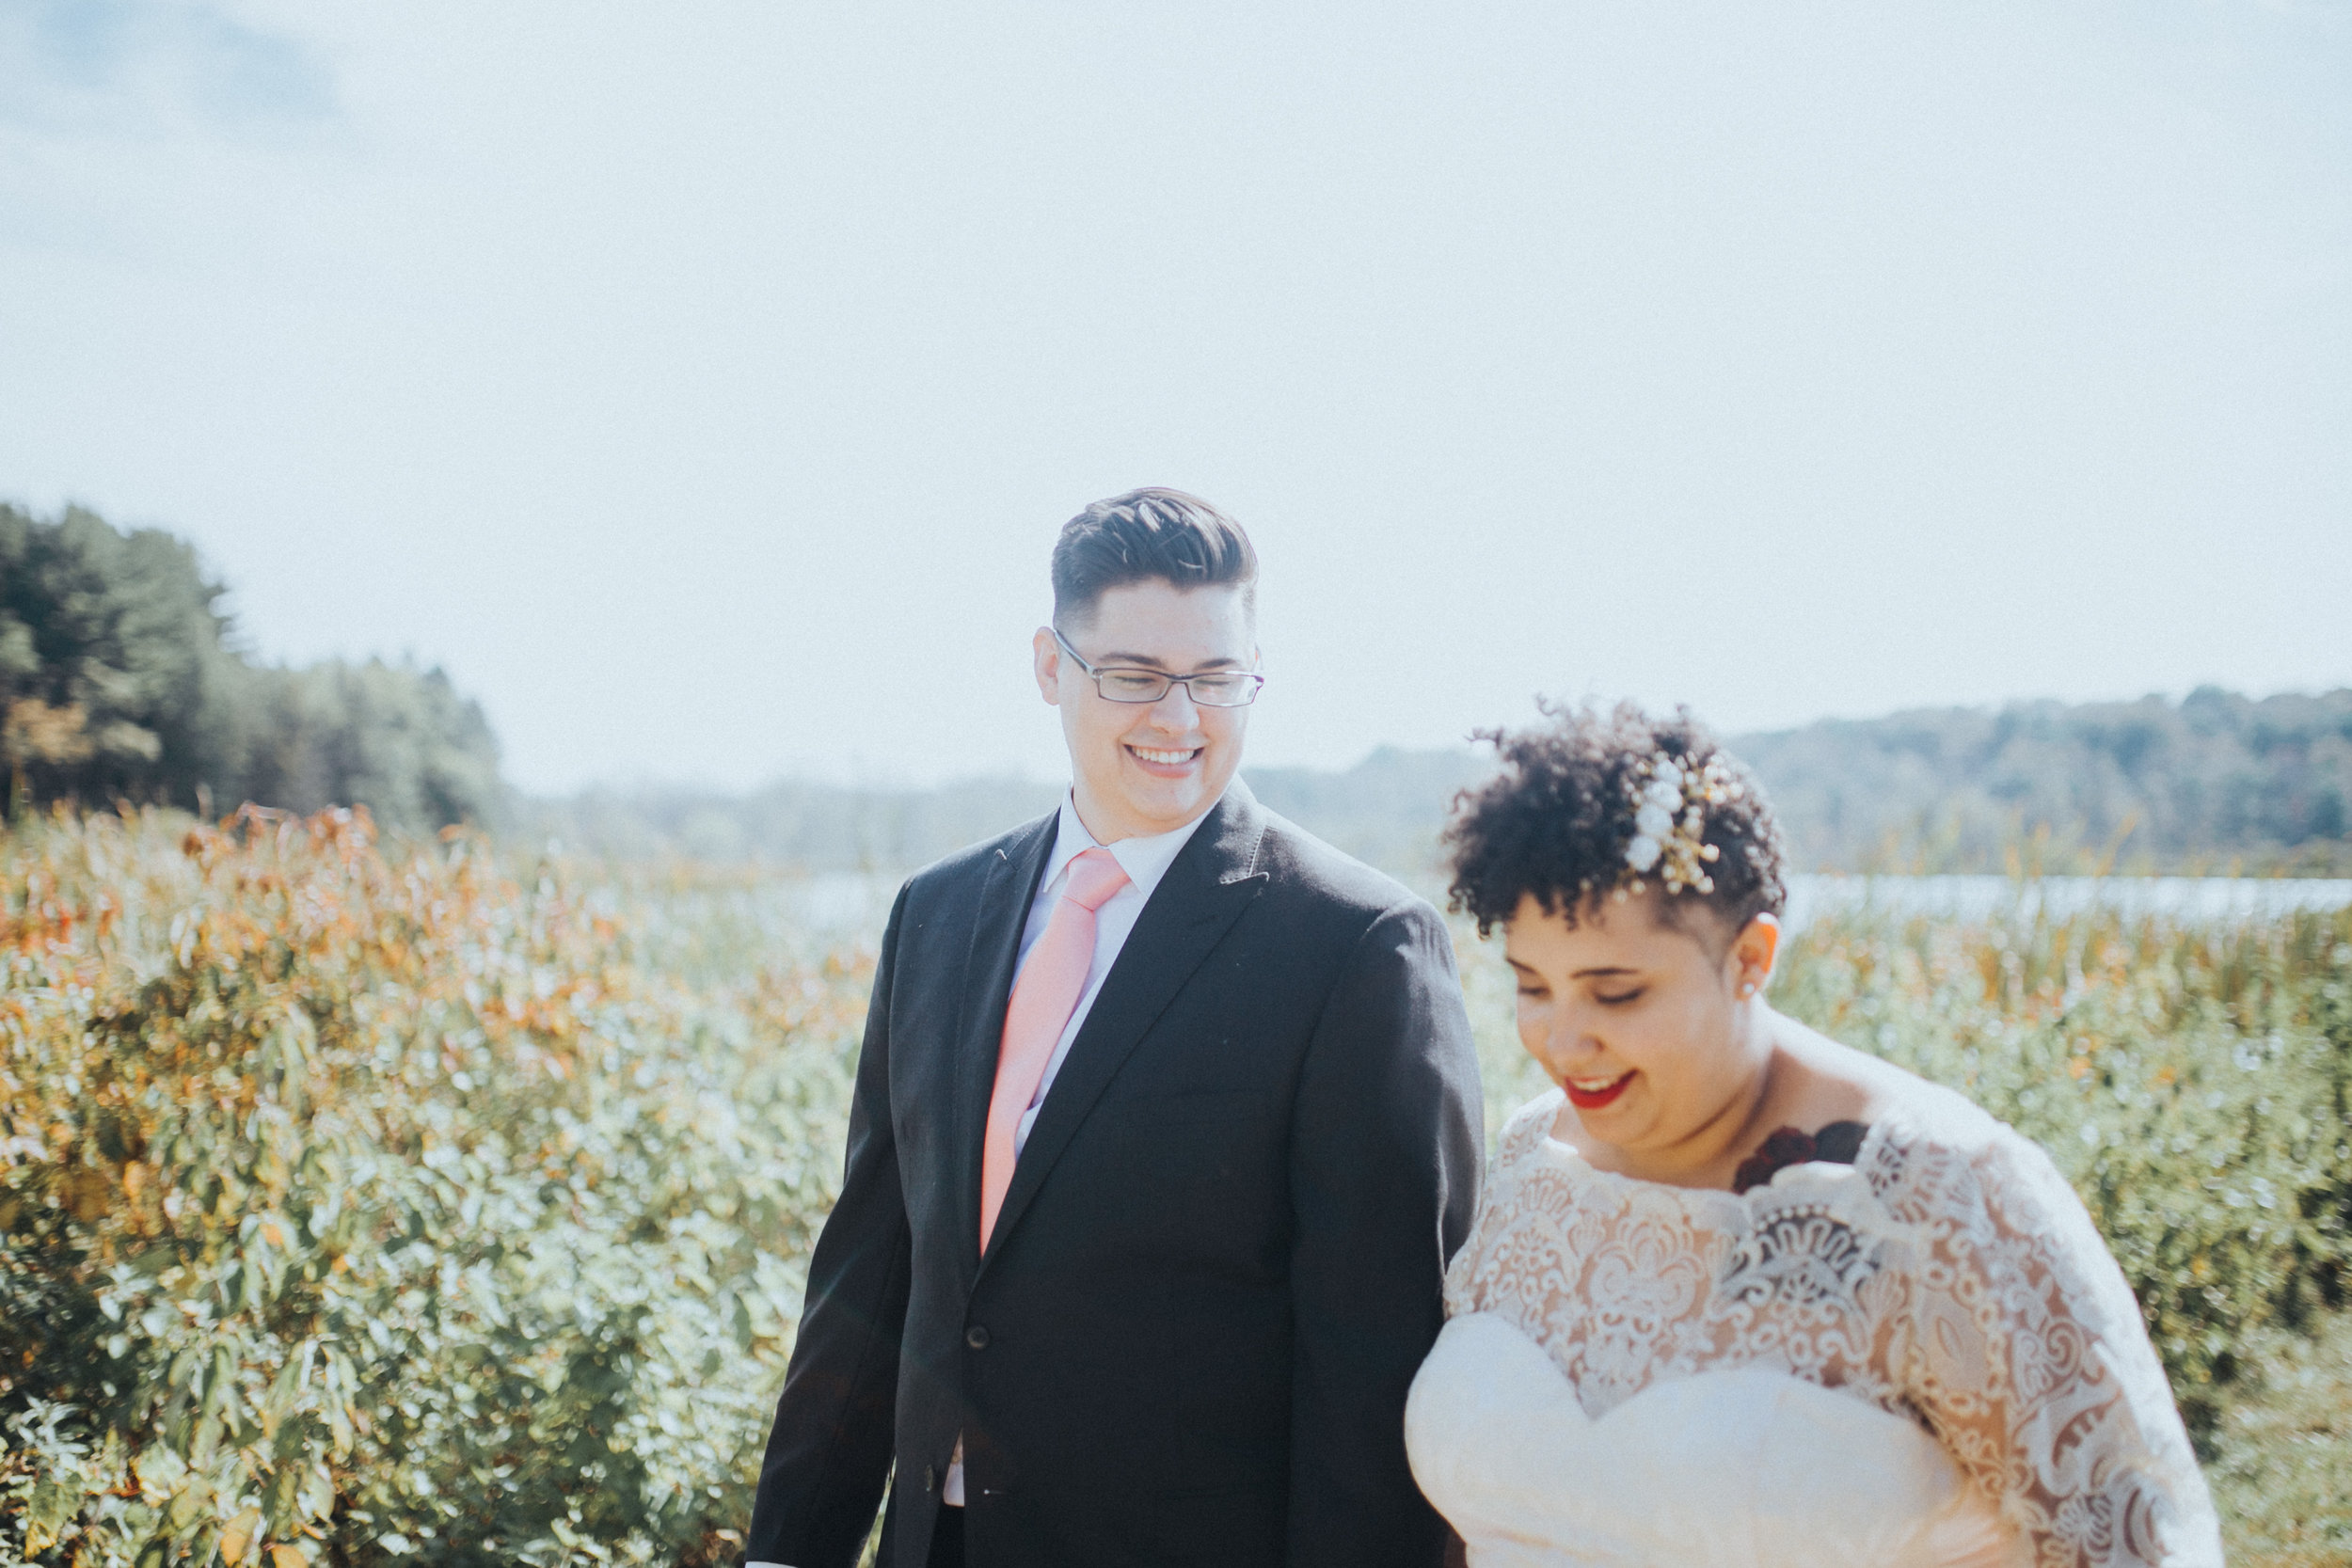 KT_Wedding-158.jpg